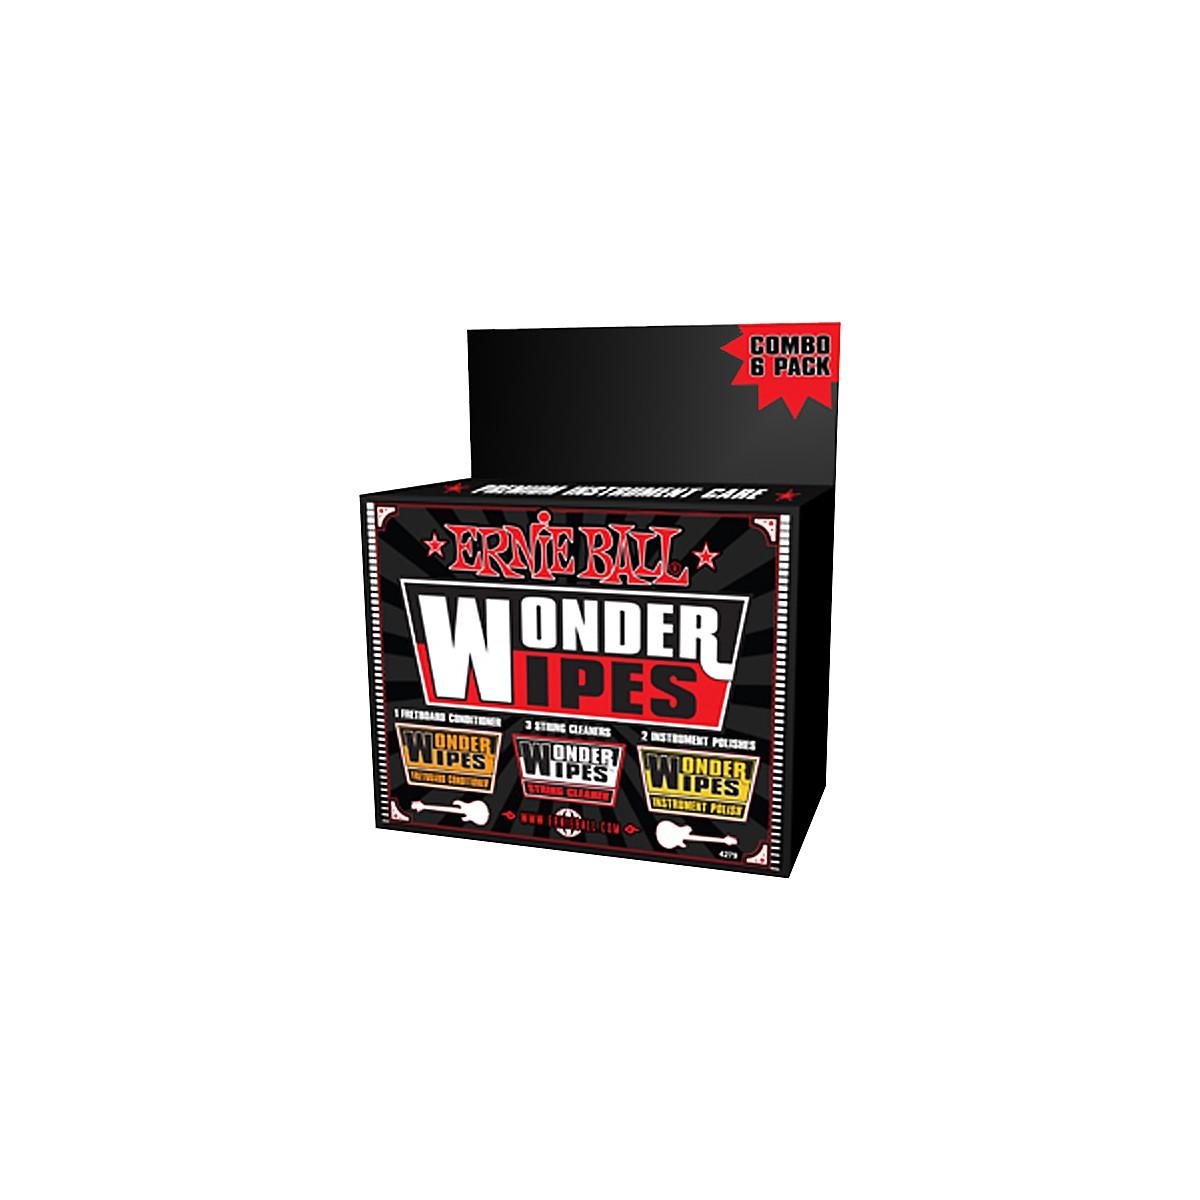 Ernie Ball Wonder Wipe Variety 6-pack